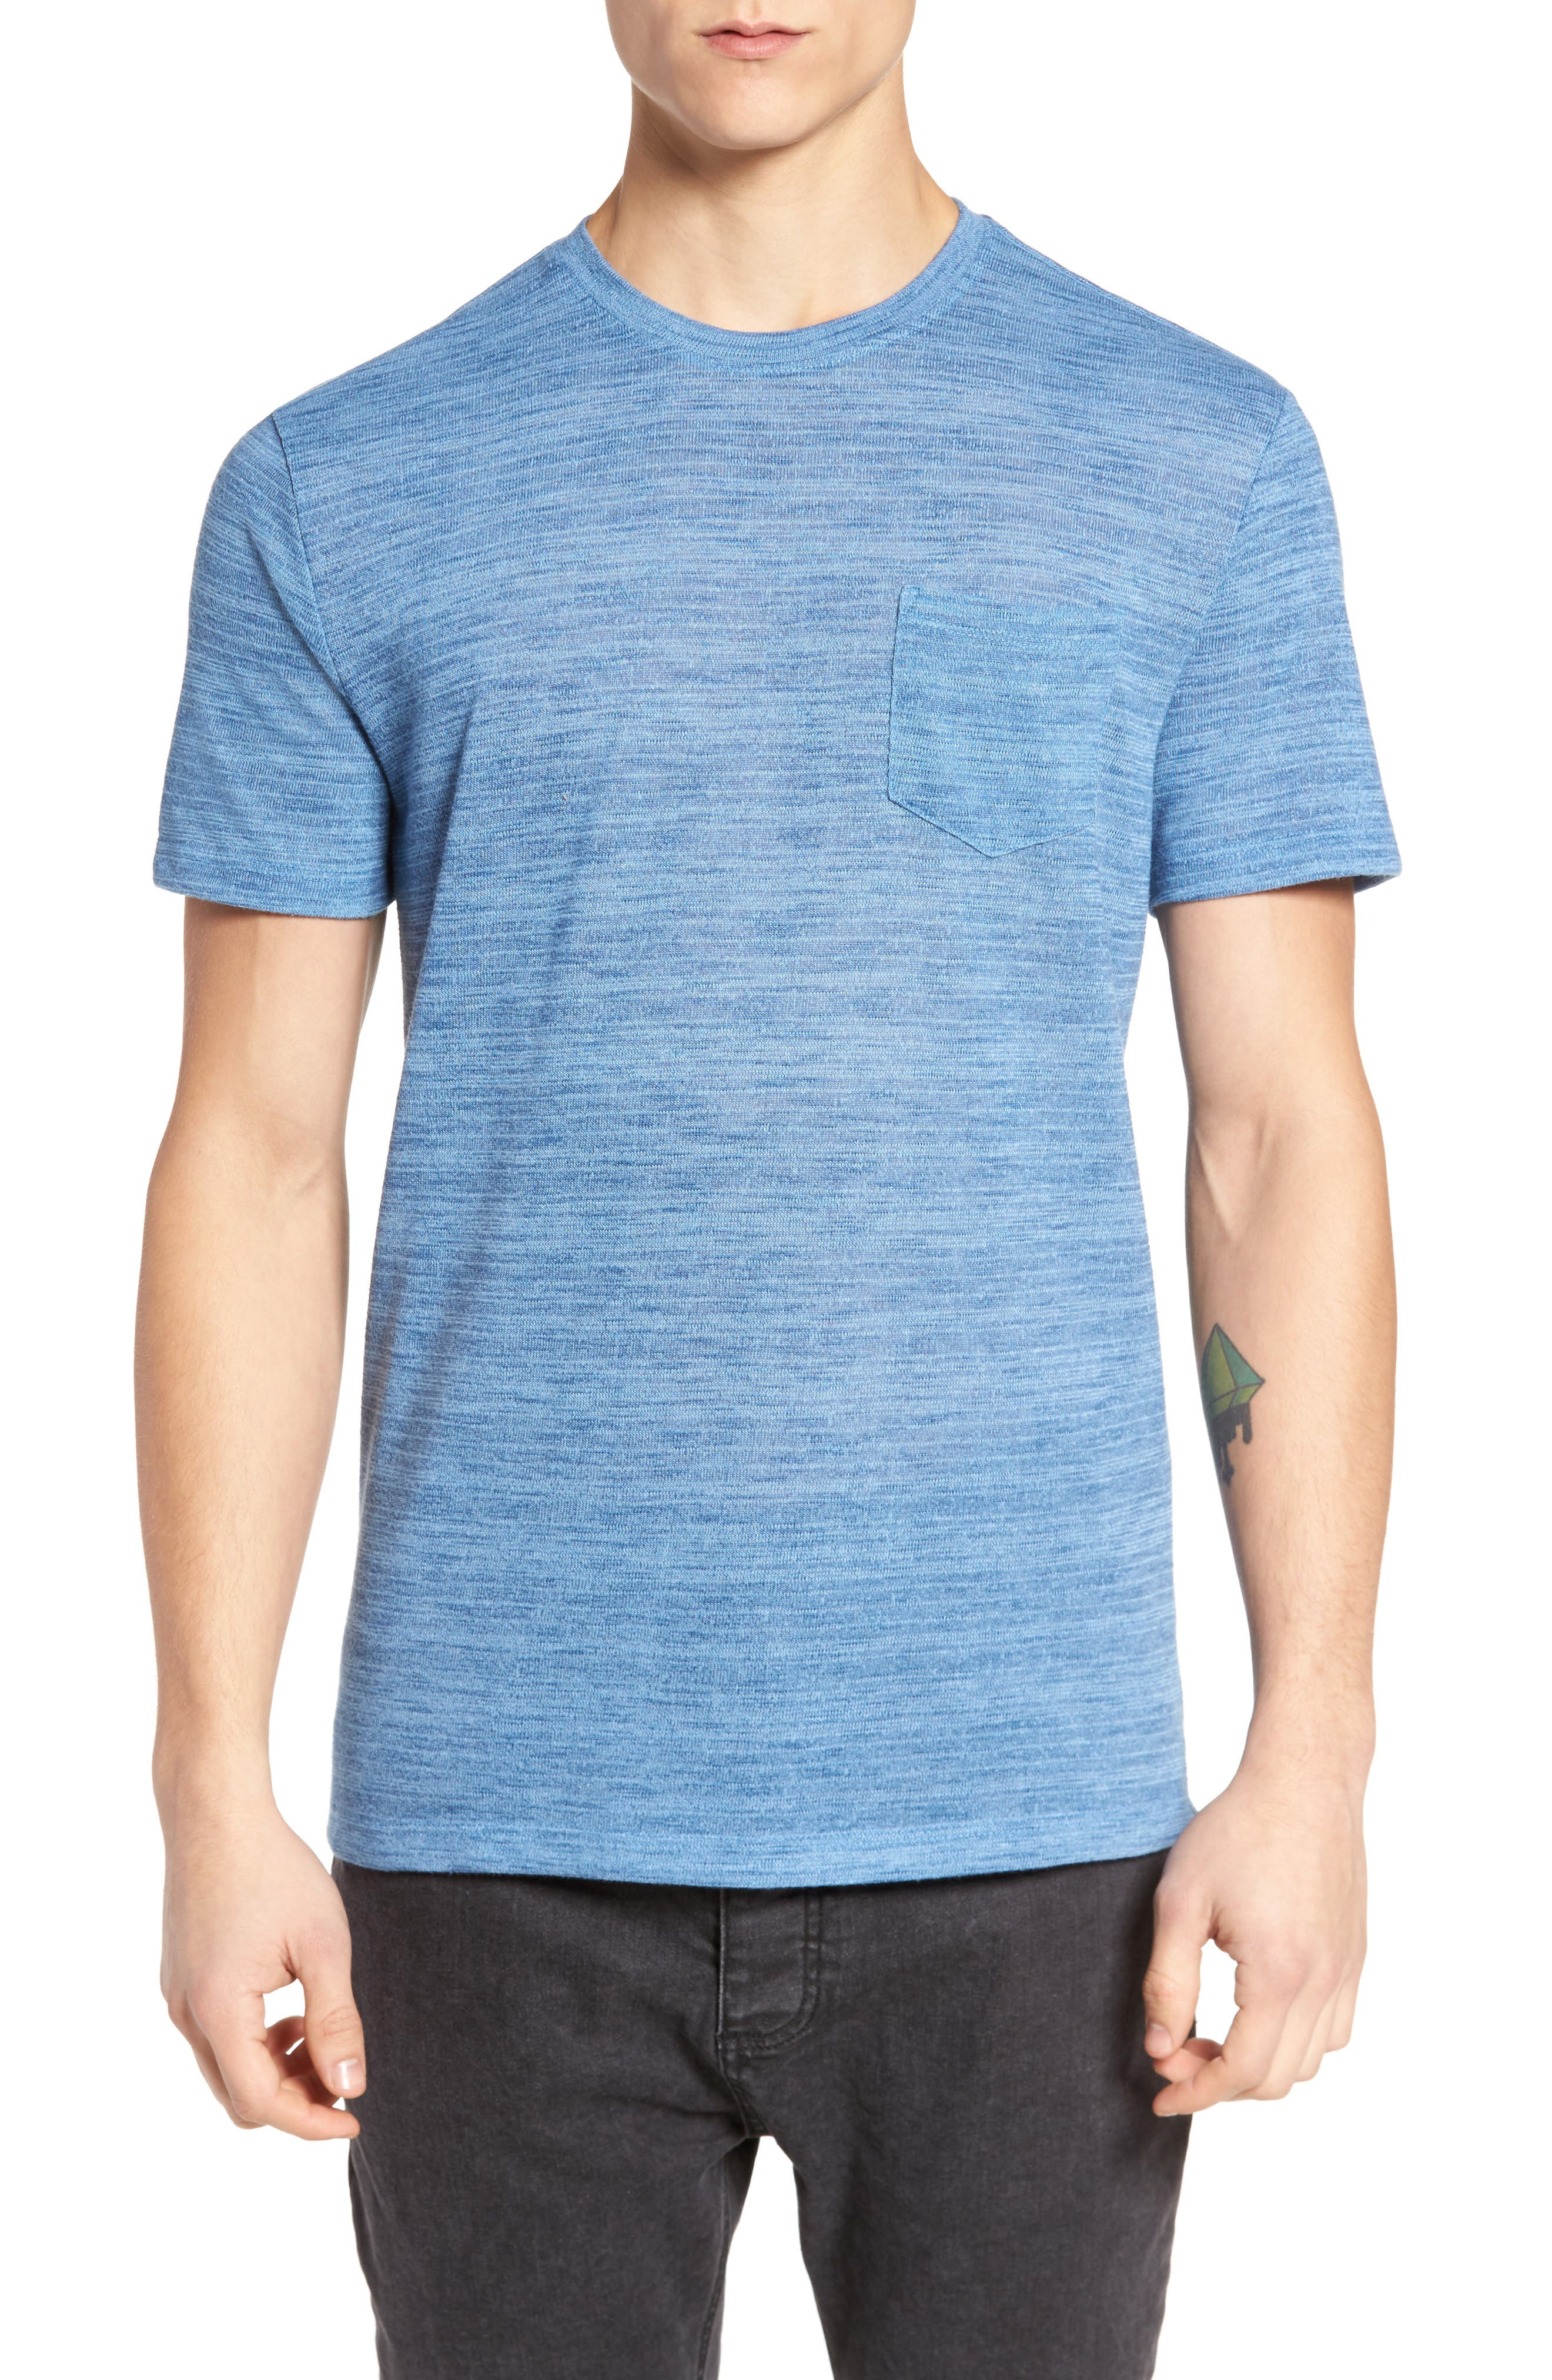 Main Image - The Rail Slubbed Pocket T-Shirt